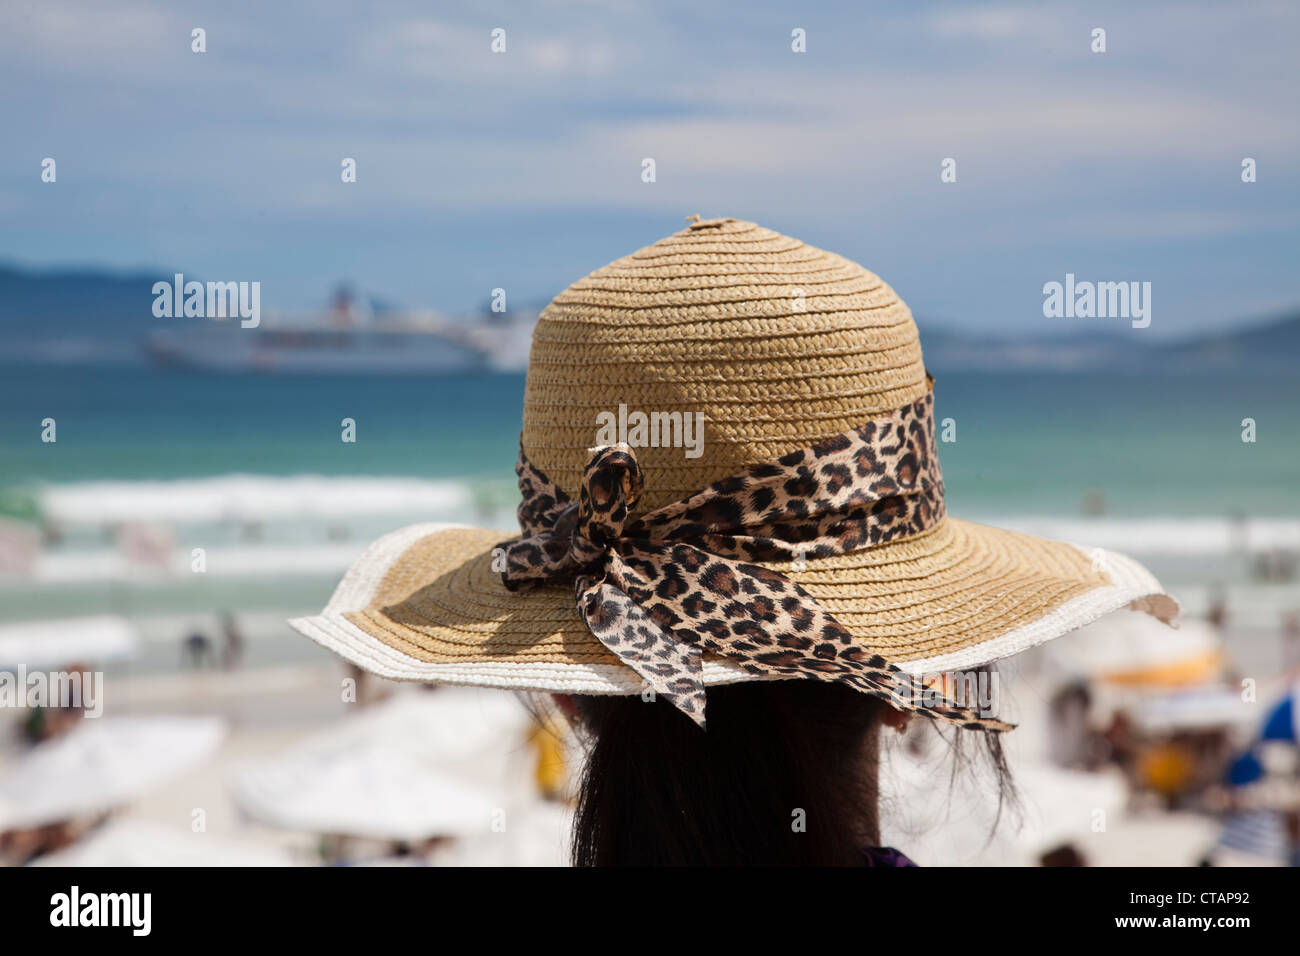 Woman with sun hat on Praia do Forte beach, Cabo Frio, Rio de Janeiro, Brazil, South America - Stock Image